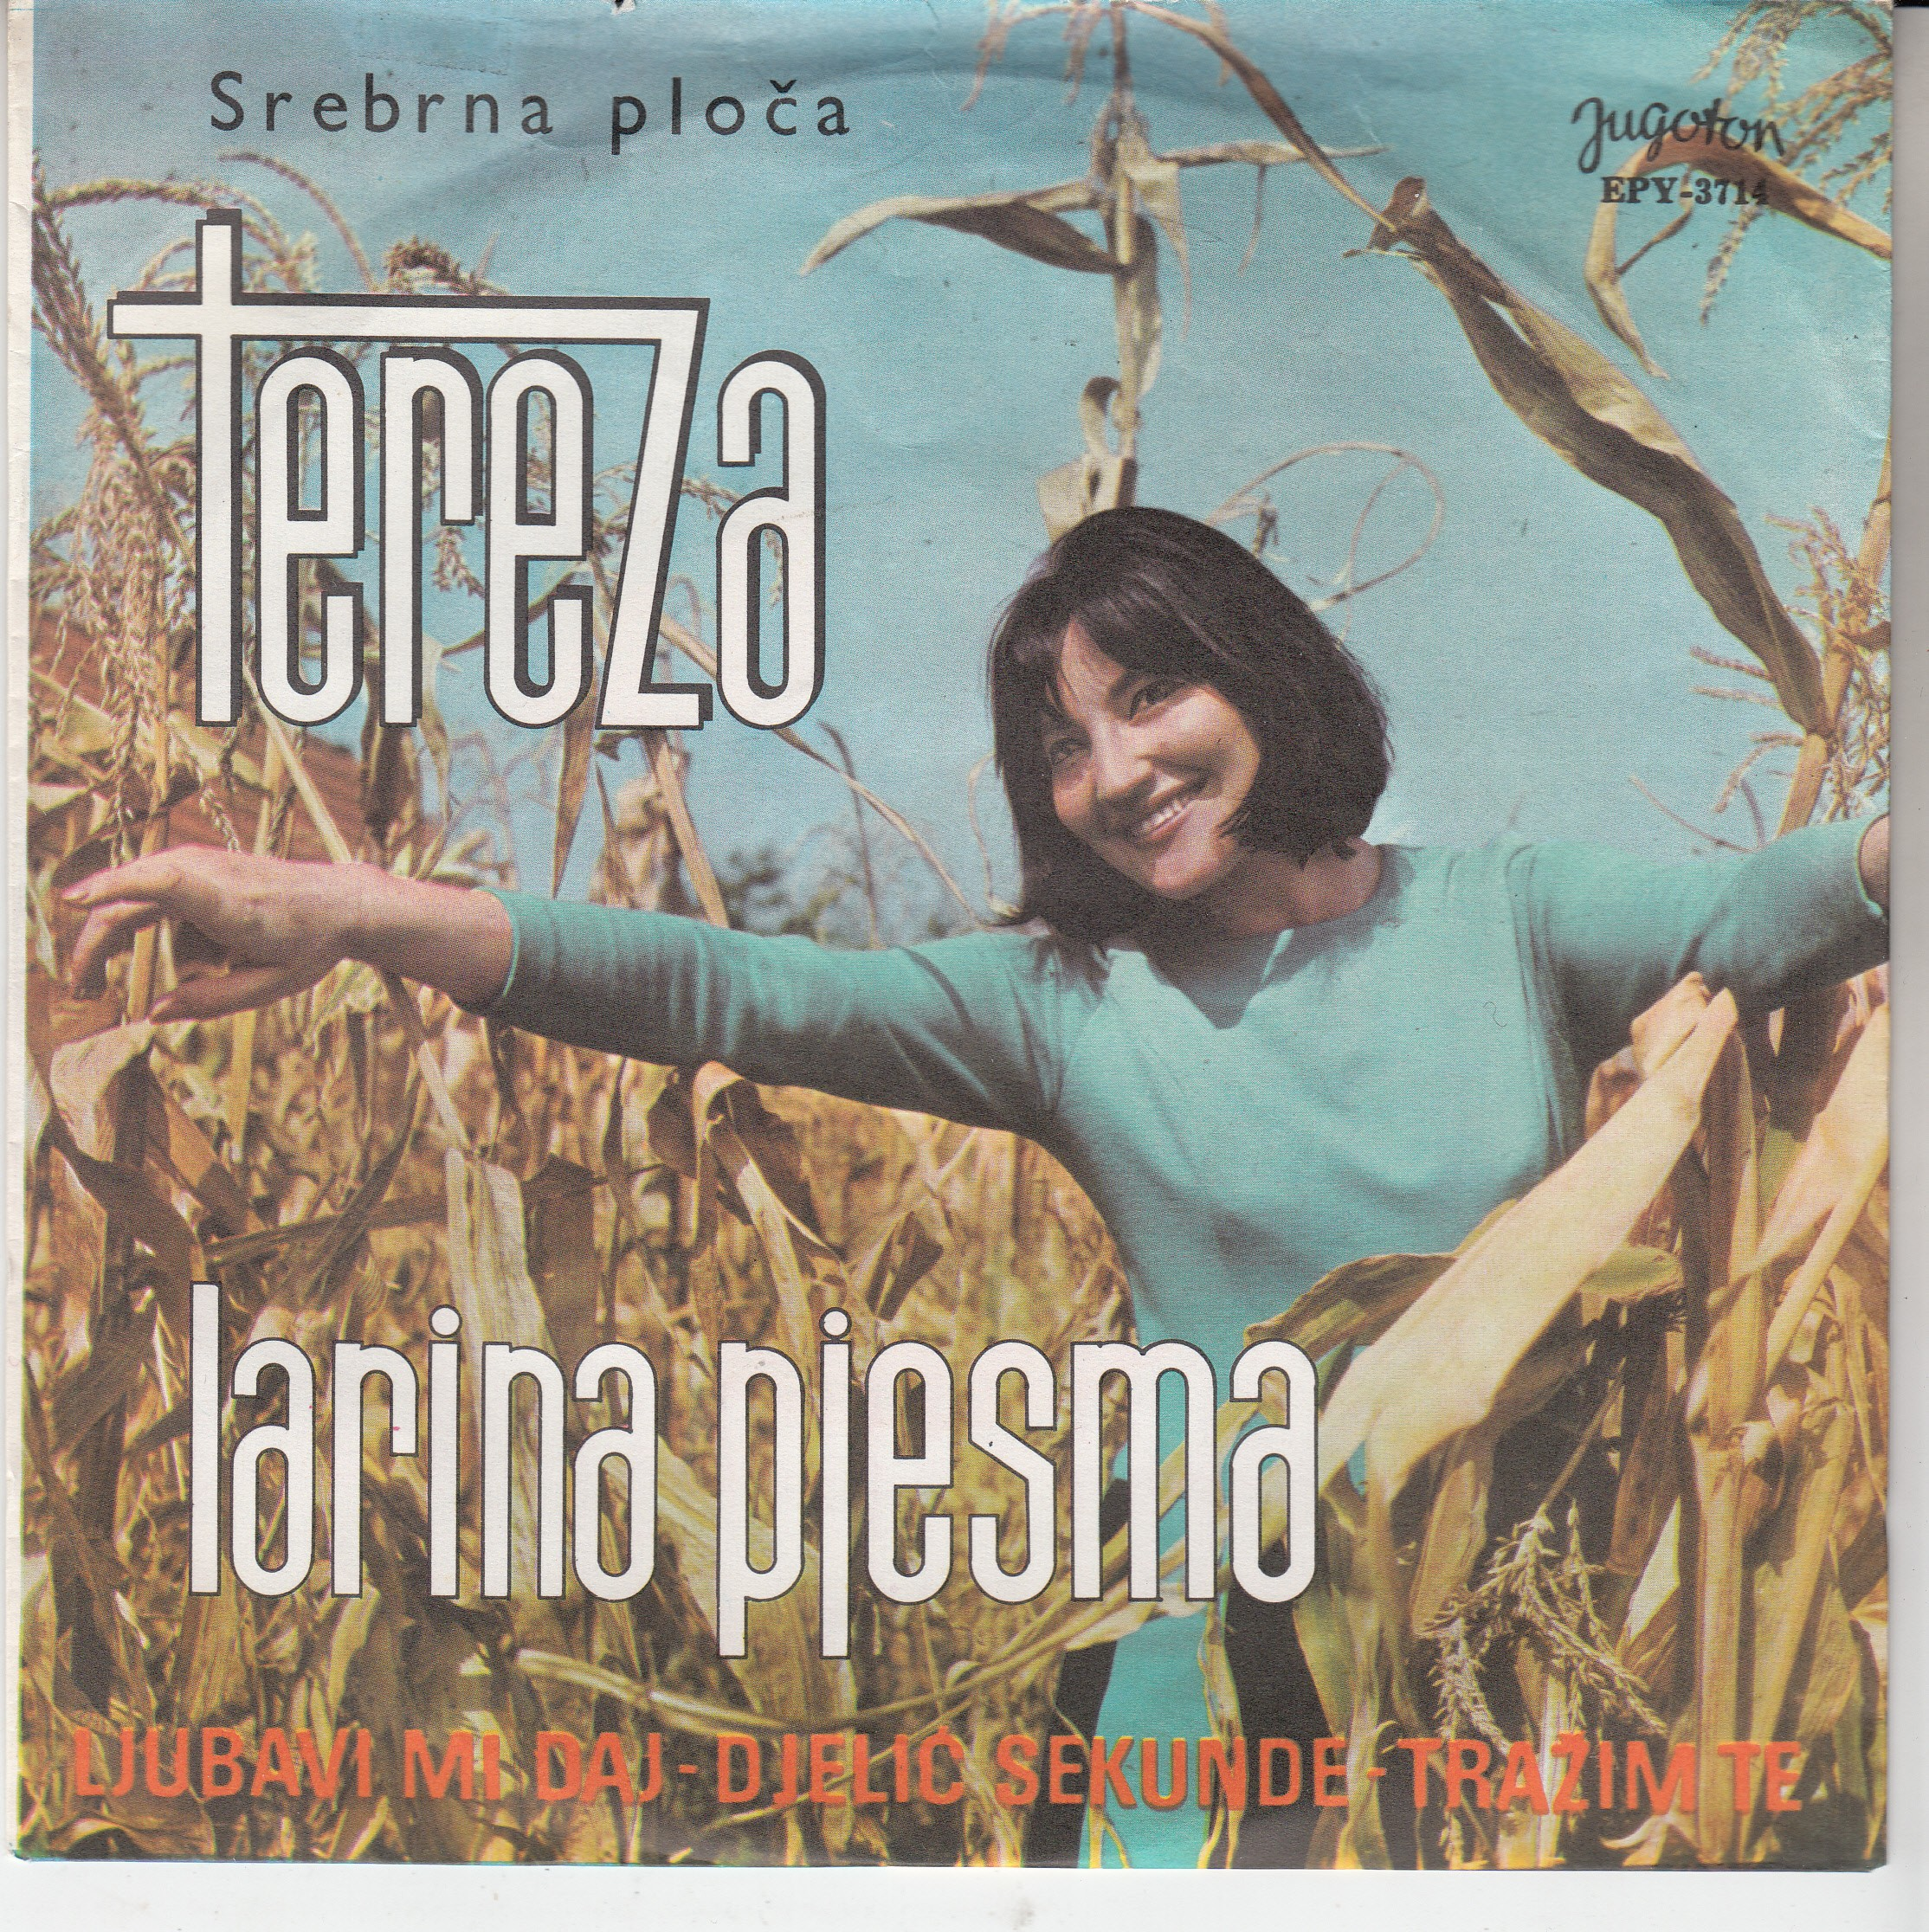 Kesovija Tereza - Larina Pjesma/ljubavi Mi Daj/djelic Sekunde/trazim Te